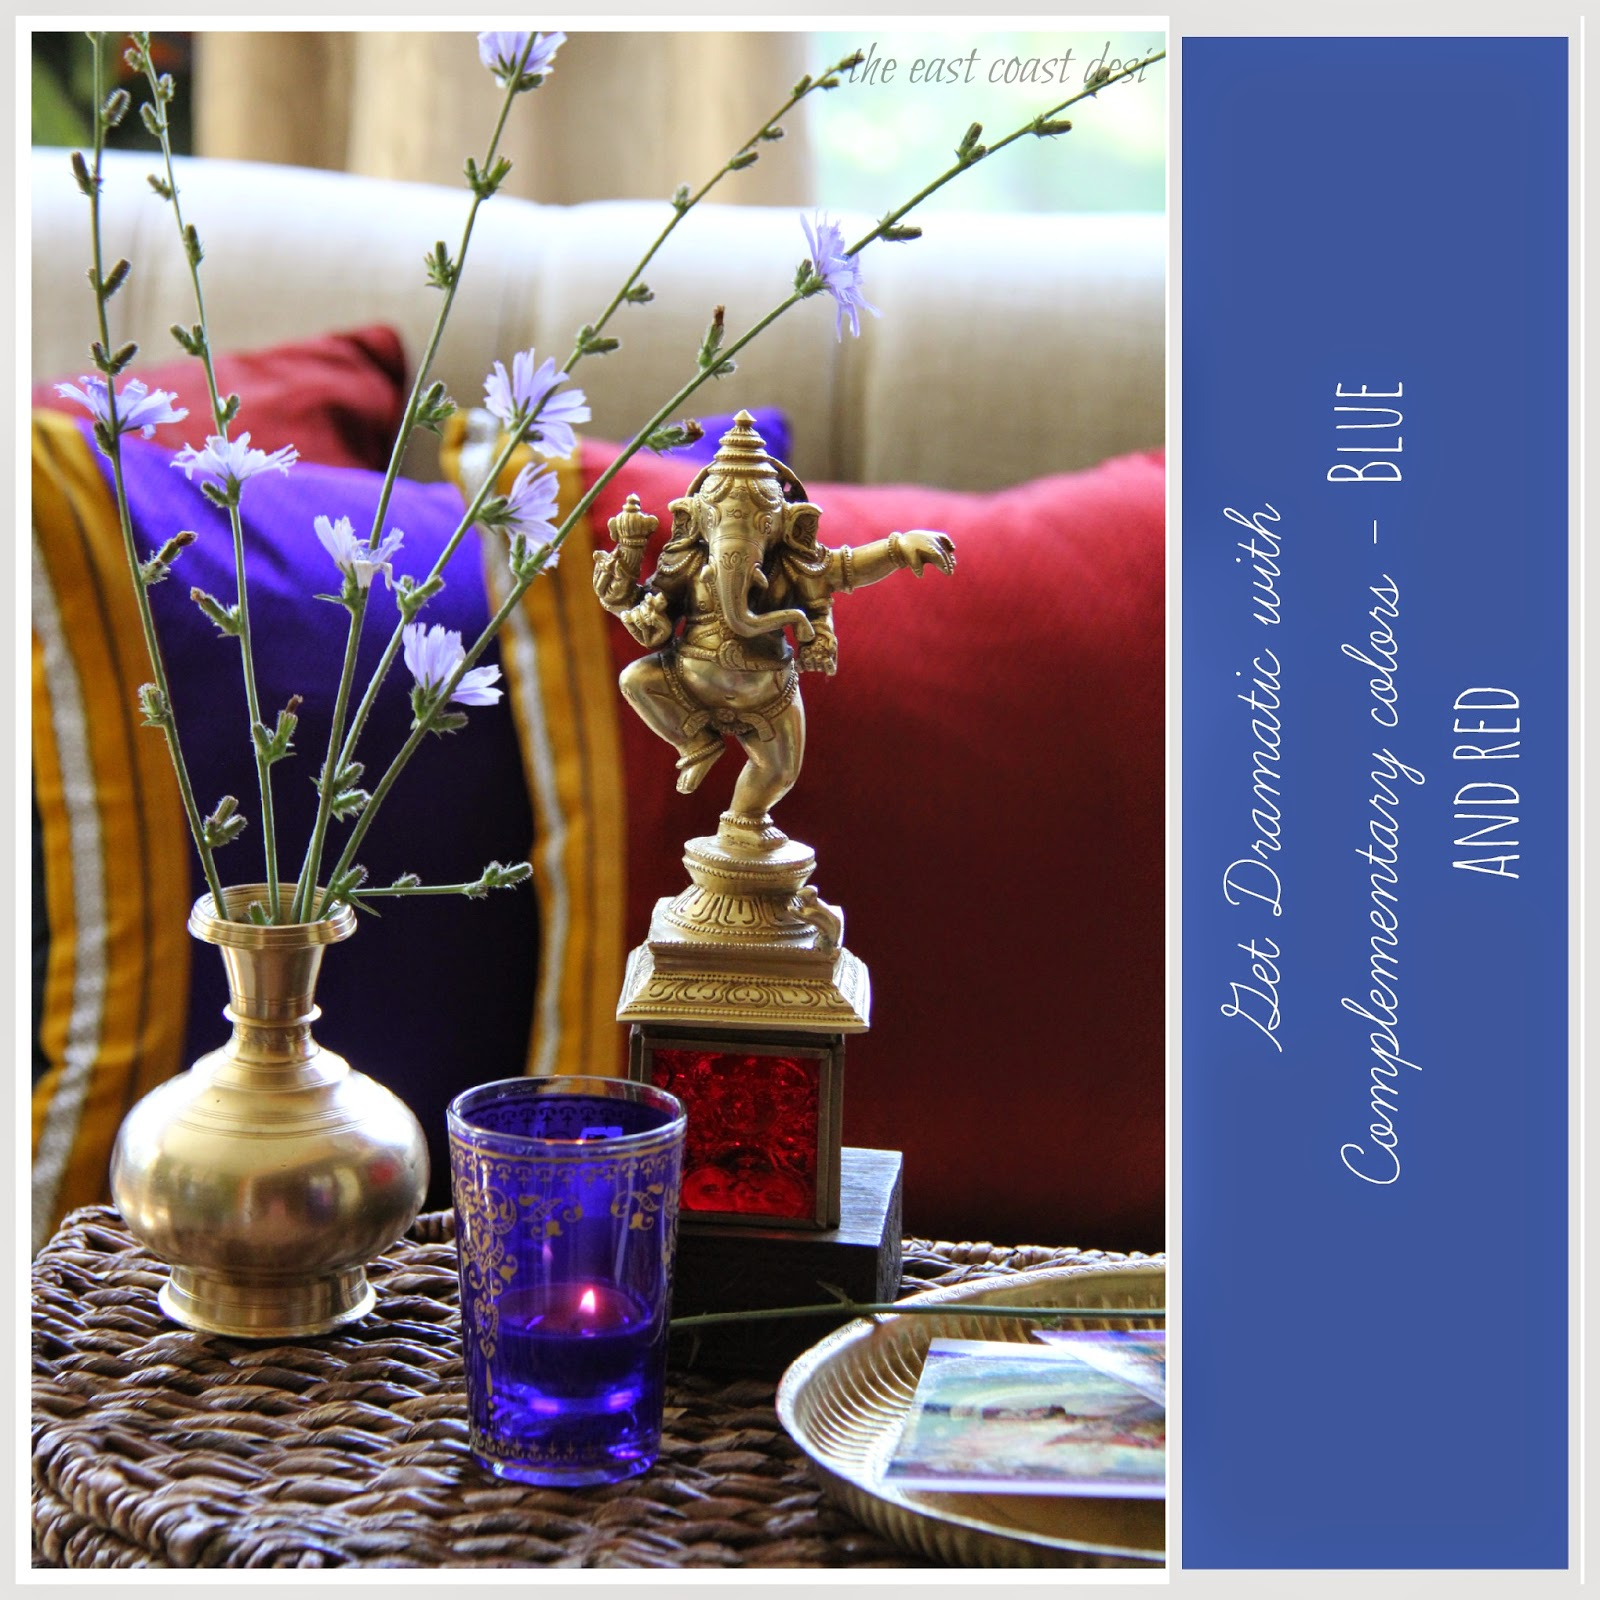 Ganesh chaturthi flowers may flower blog - Celebrate Ganesh Chaturthi In Glorious Technicolor